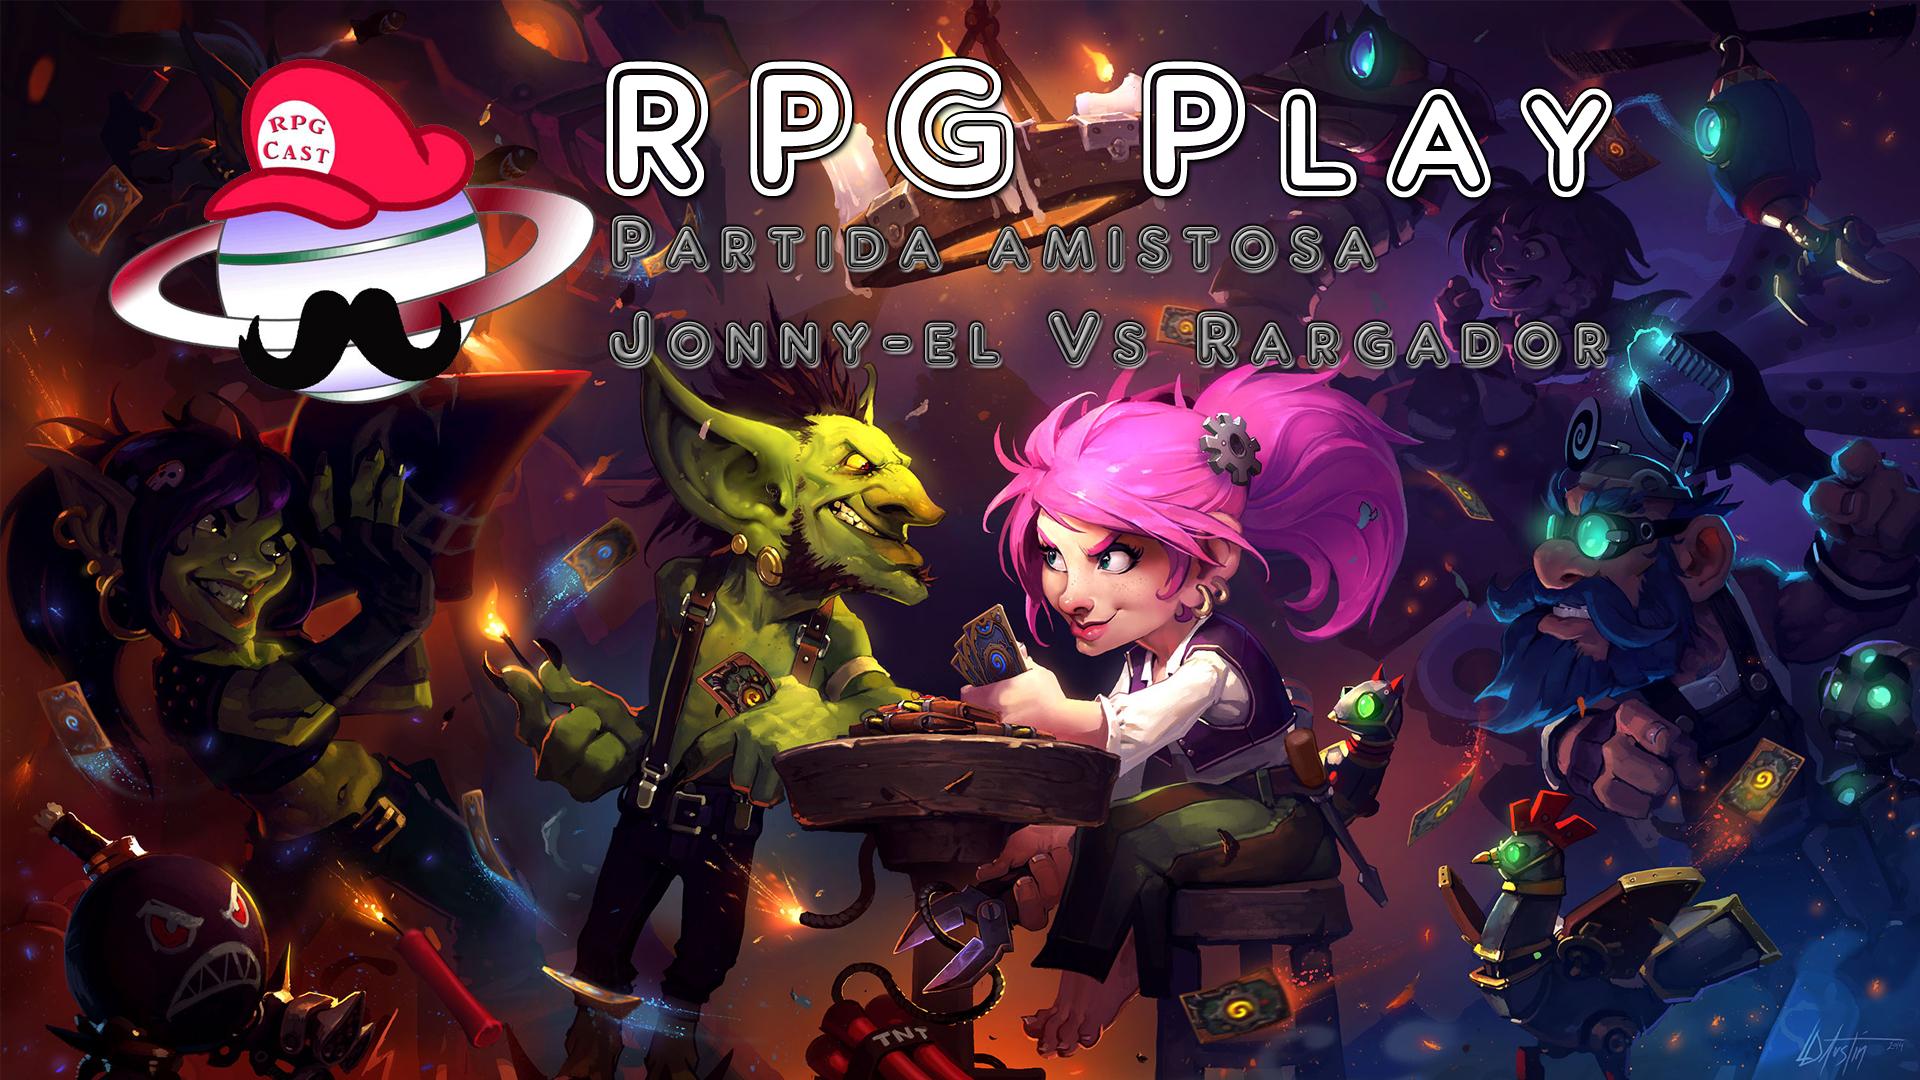 RPG Play Jonny el vs Rargador